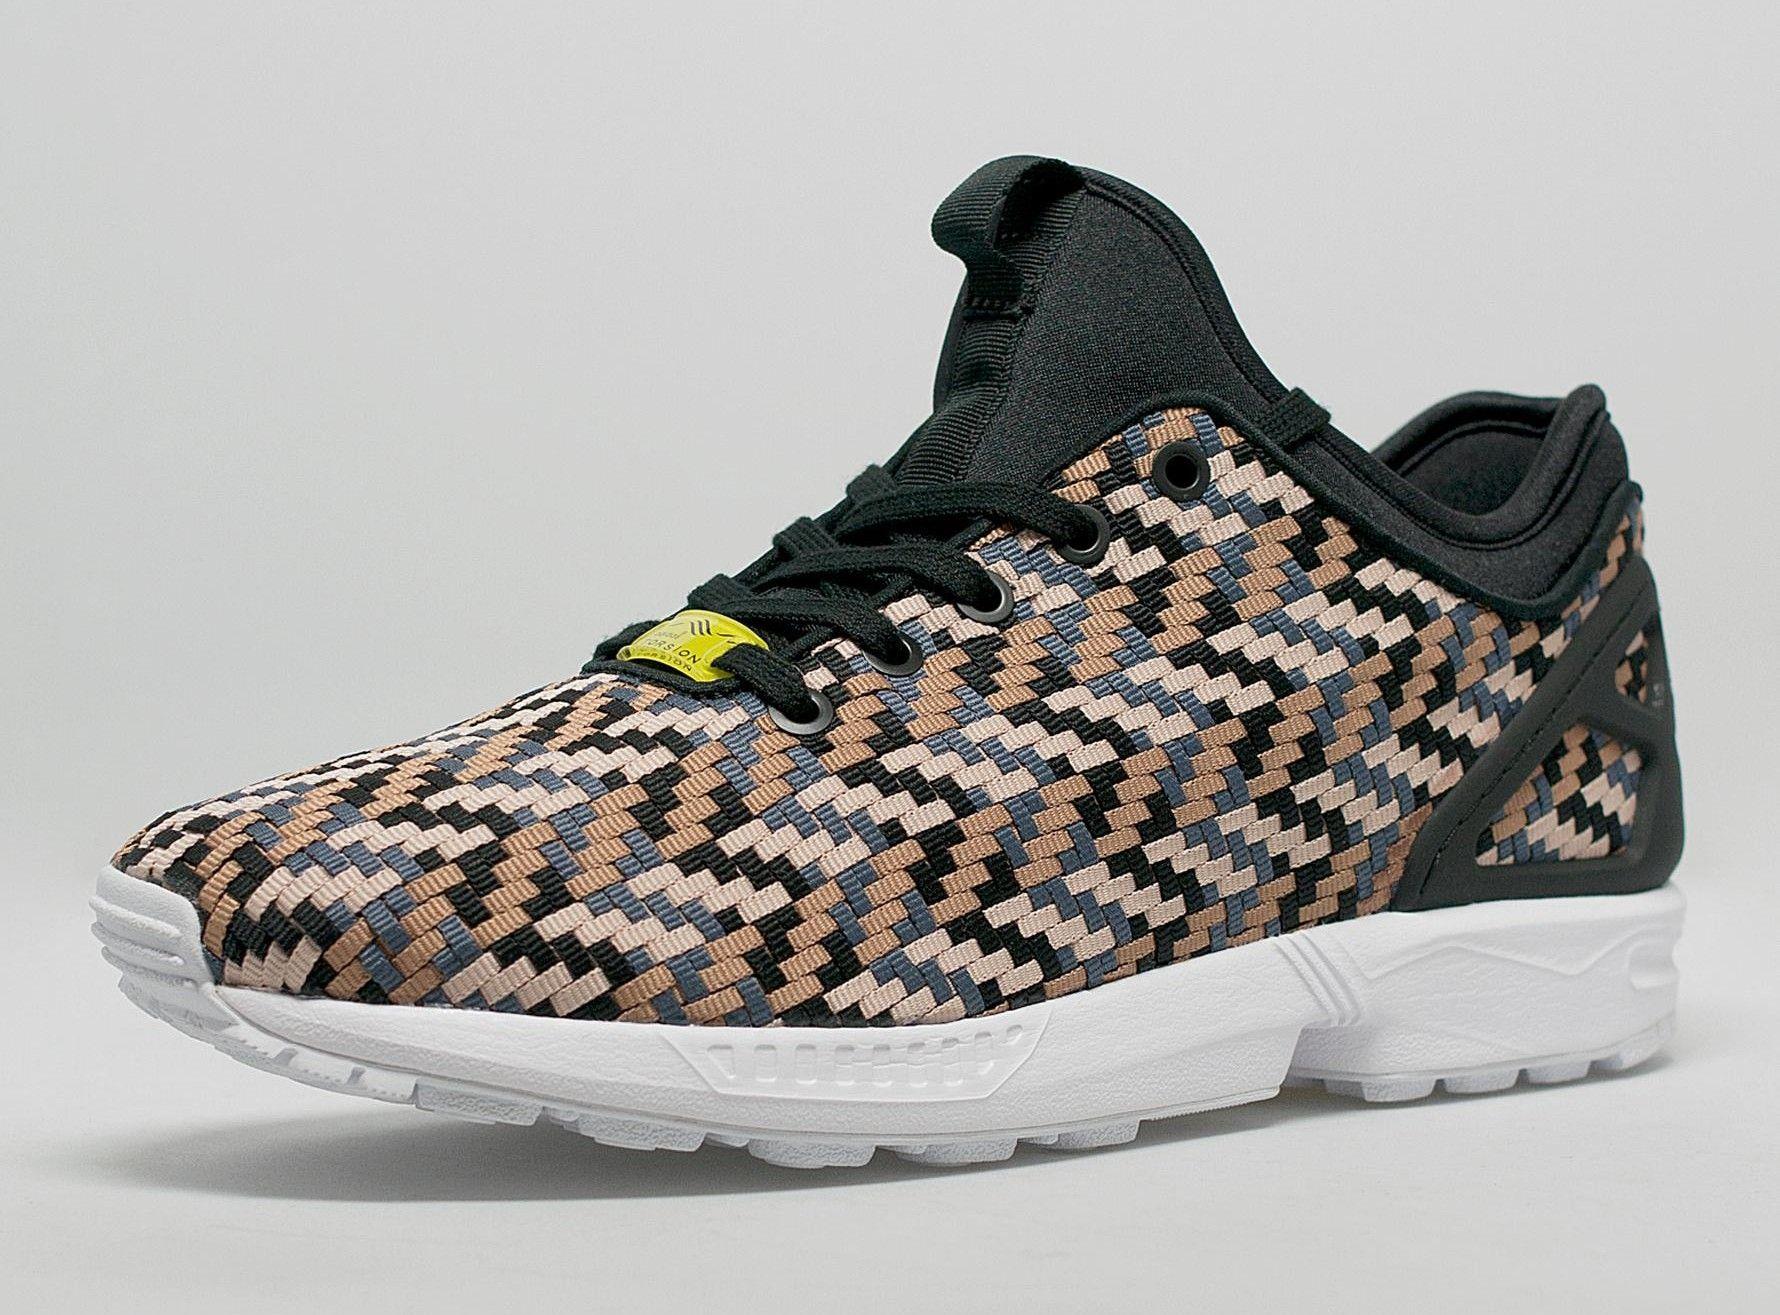 innovative design 57b1a 5dea6 adidas ZX Flux NPS Woven Herringbone | KixandtheCity.com ...